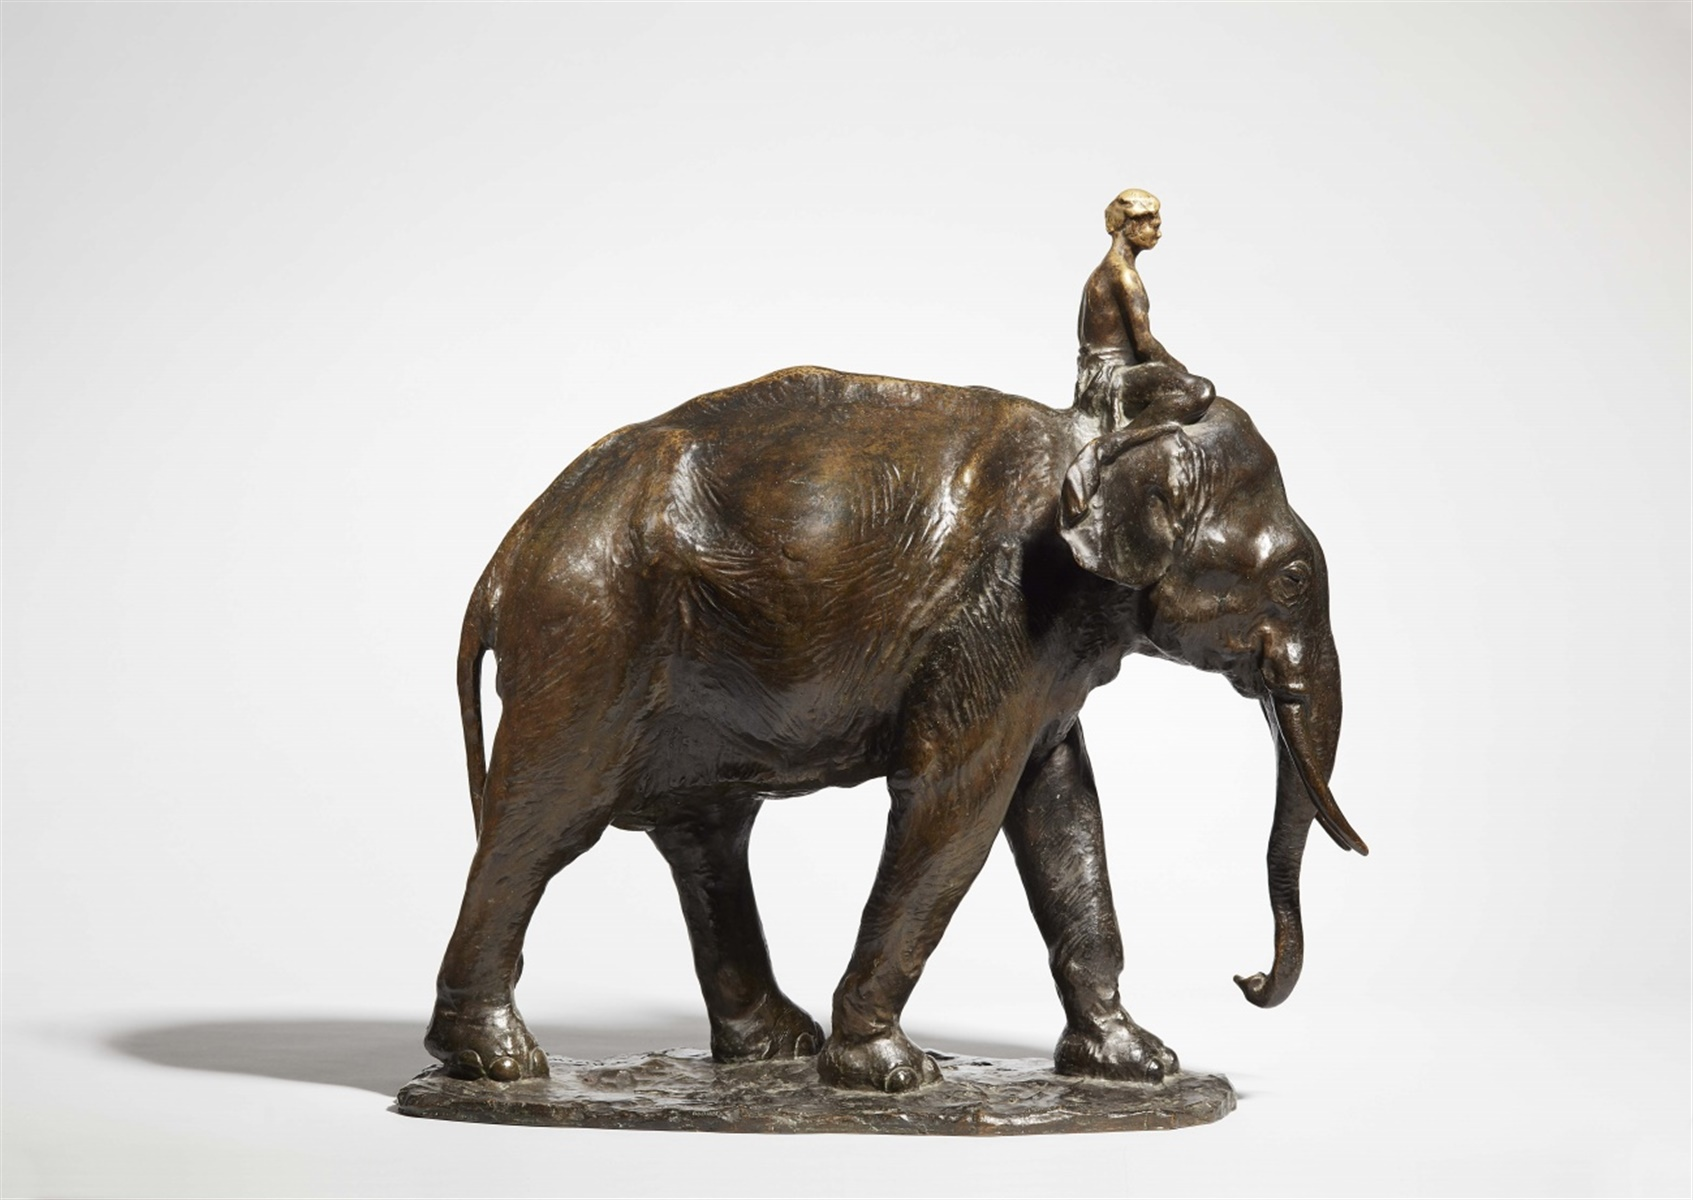 Lot 51 - Eléphant et mahoutBronze gegossen, ziseliert und patiniert. Bedeutende Tierplastik im